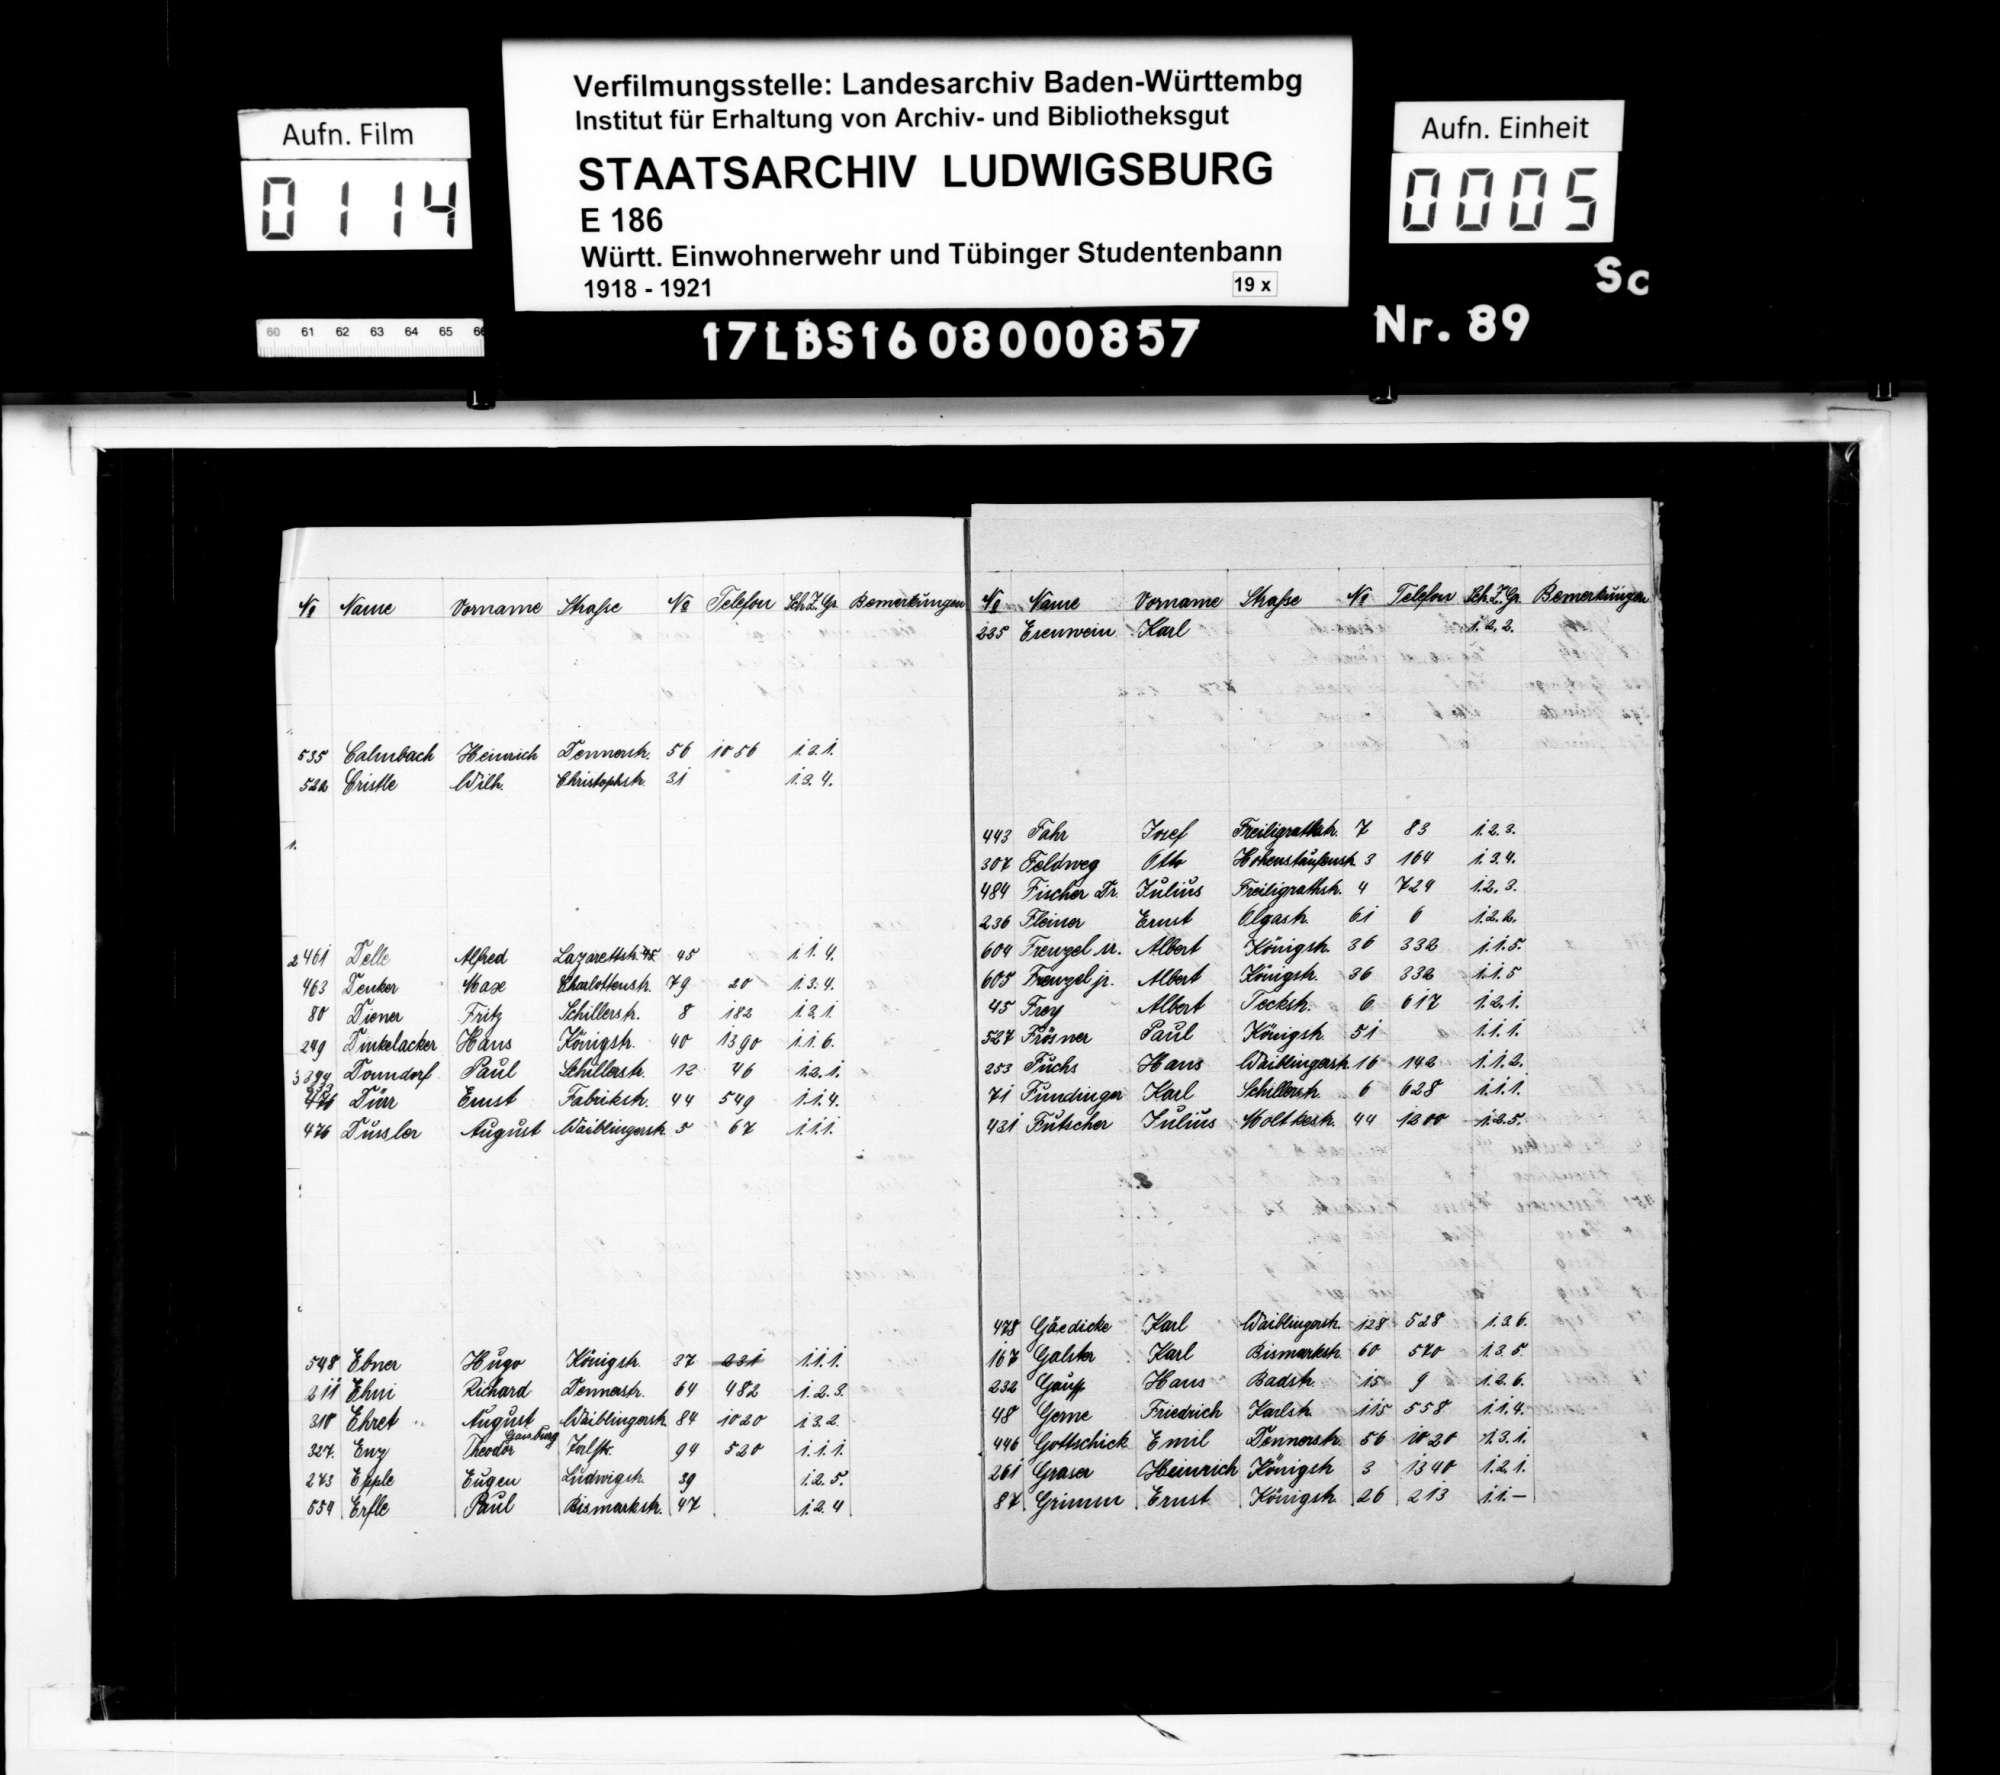 Bann Cannstatt/Schar 1: Namensliste, Bild 3